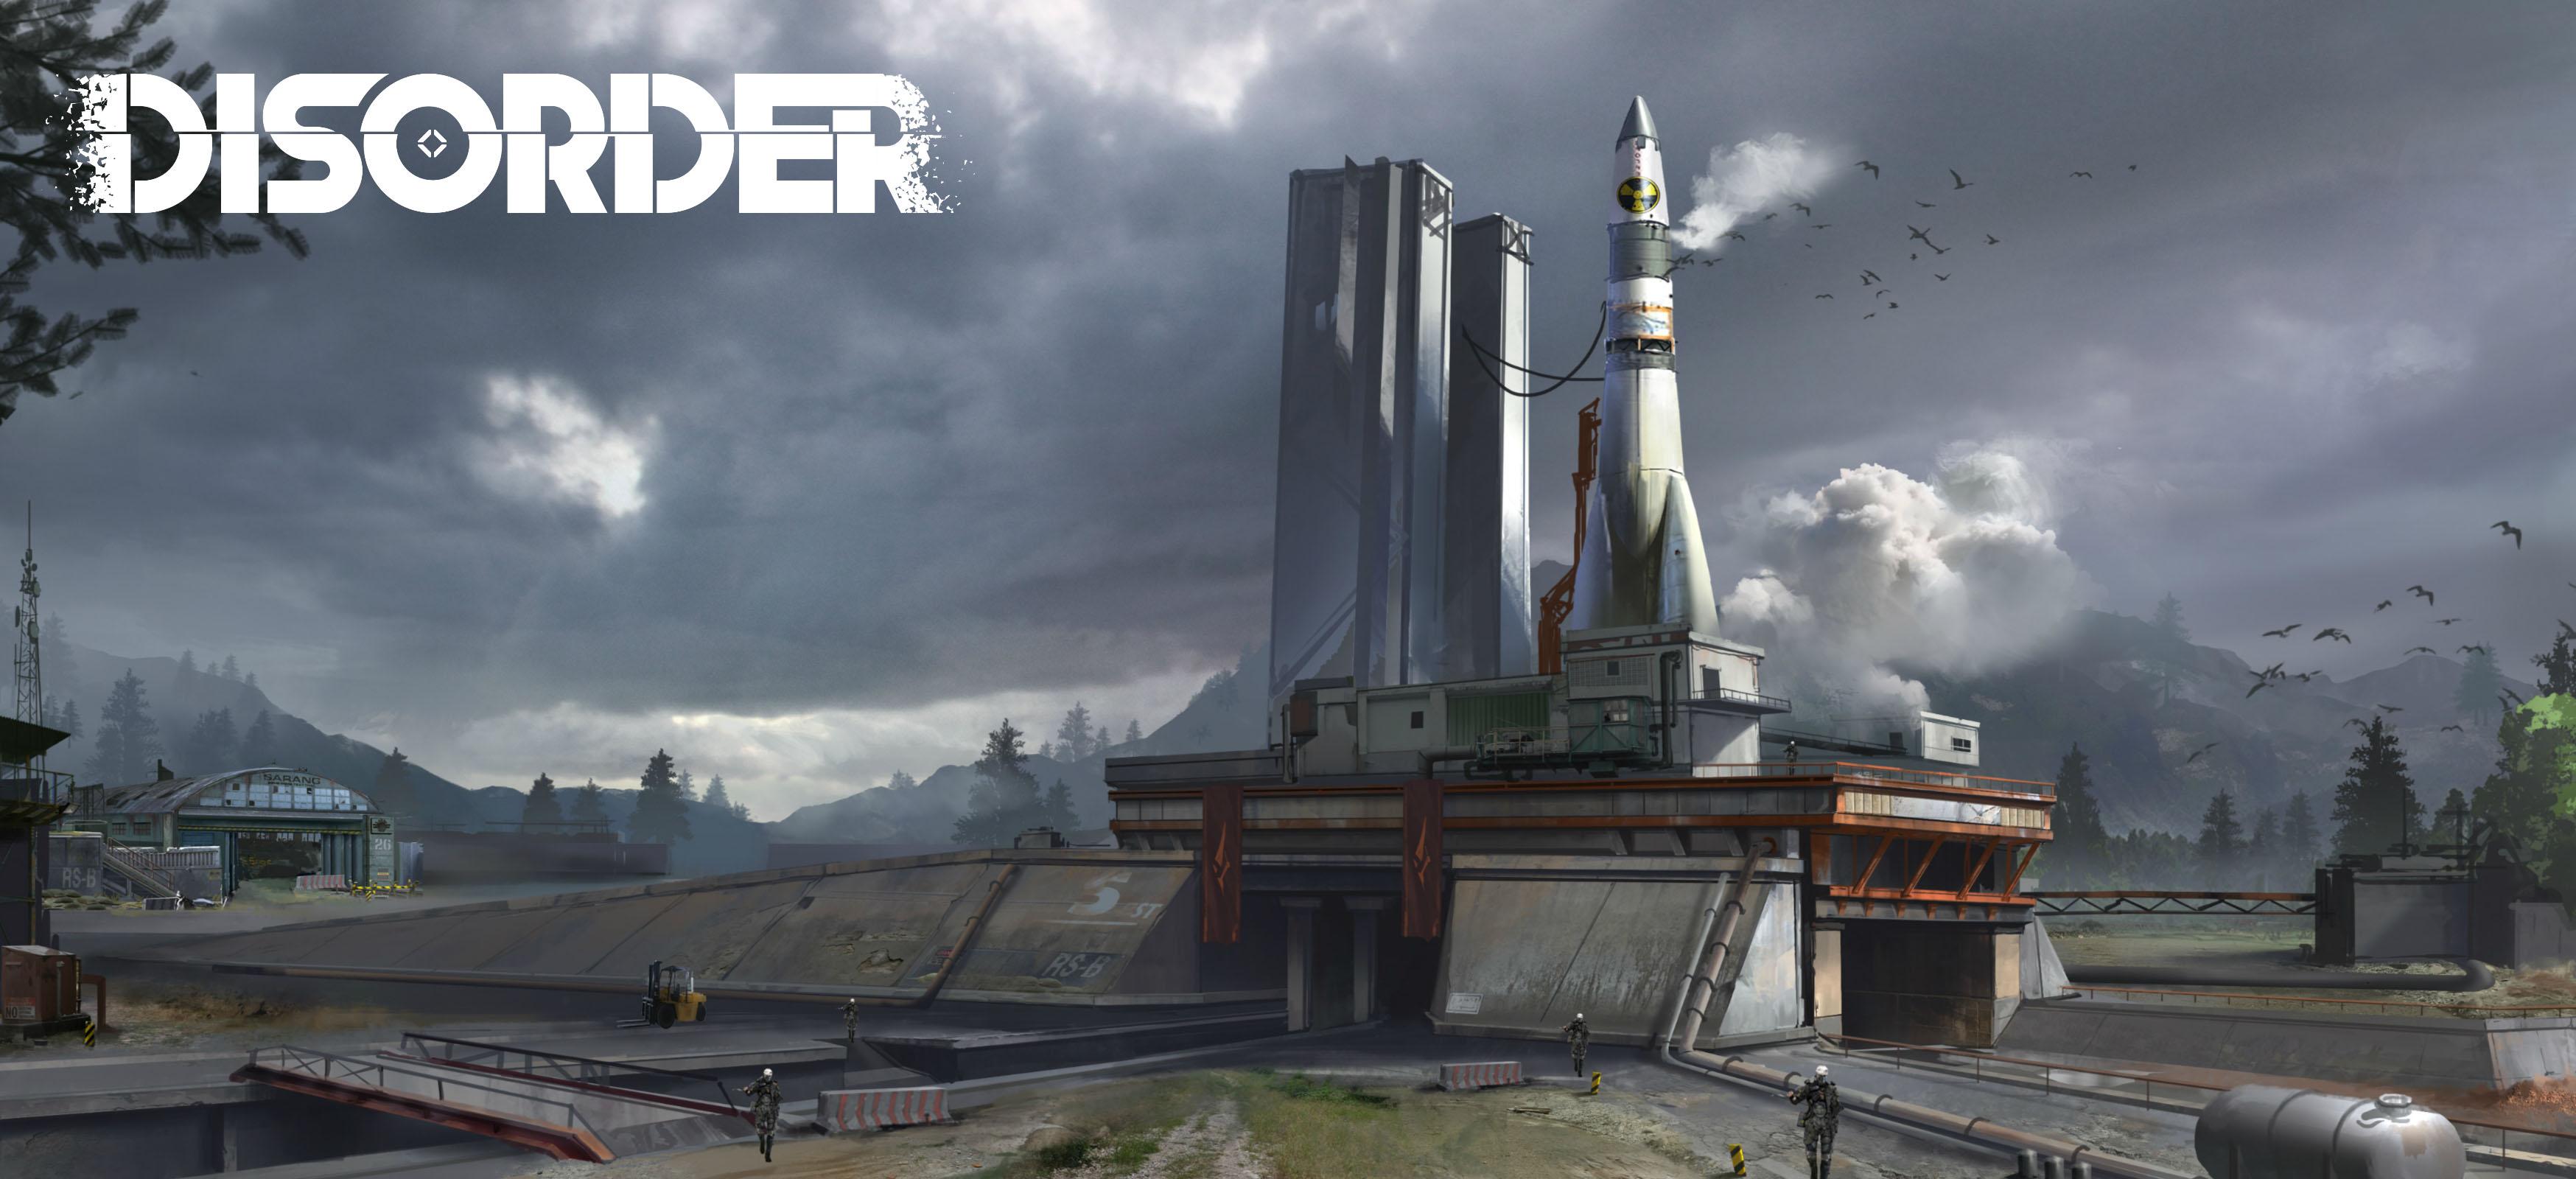 《Disorder》首次海外测试开启 全球预约火热进行[视频][多图]图片2